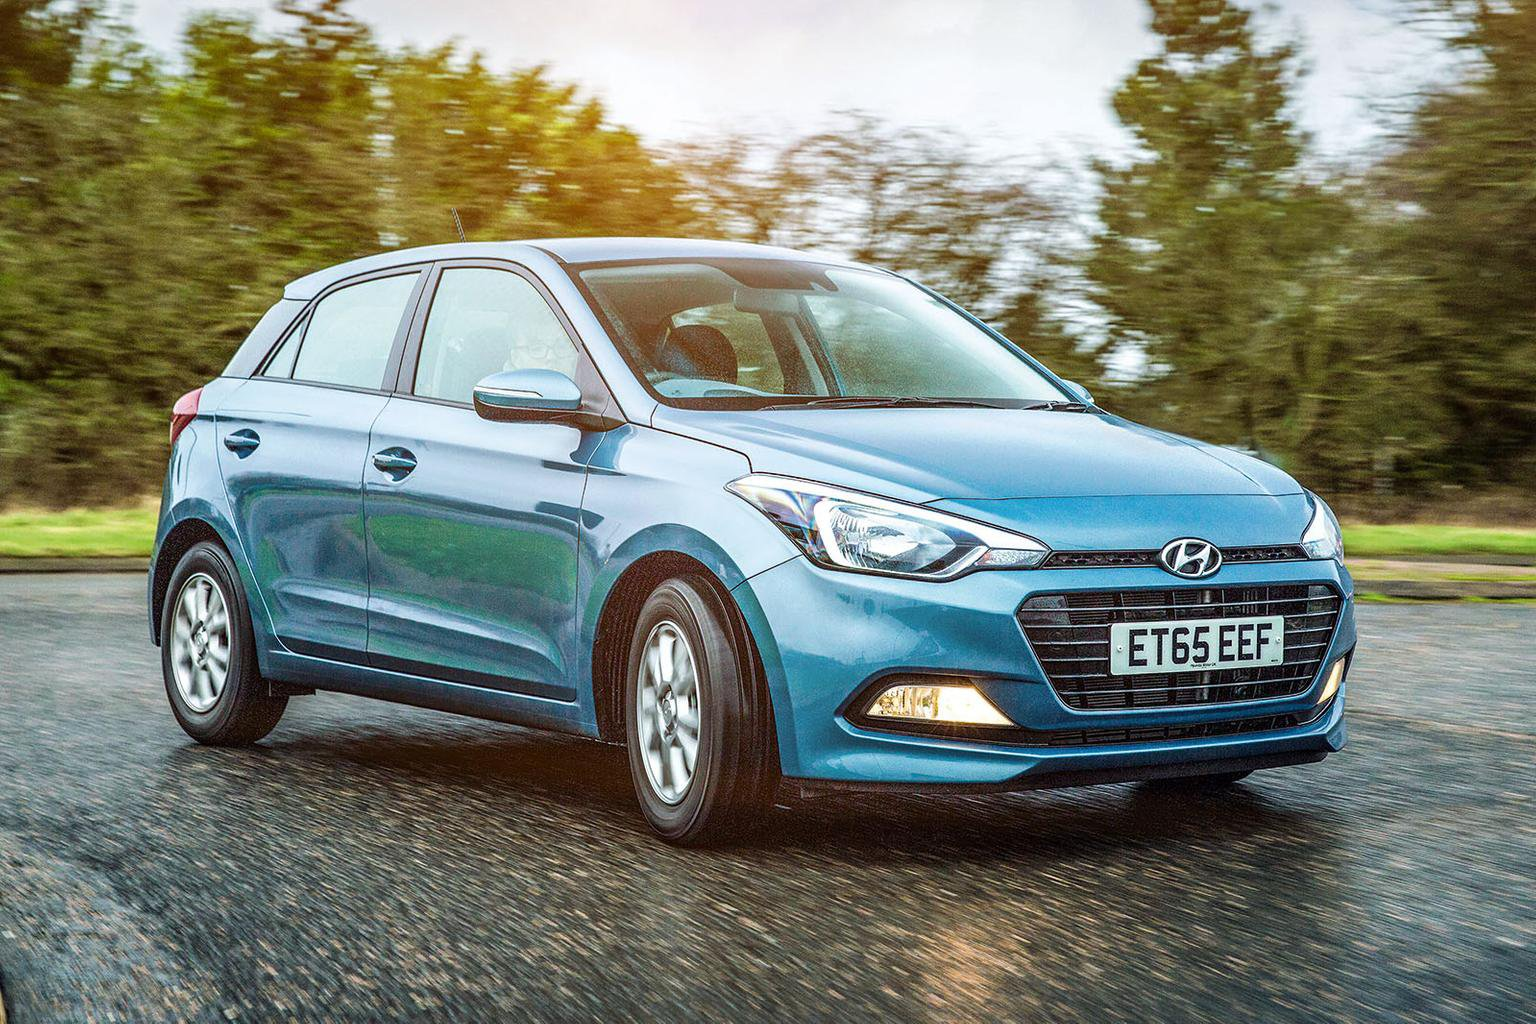 2016 Hyundai i20 1.0 T-GDI 100 review